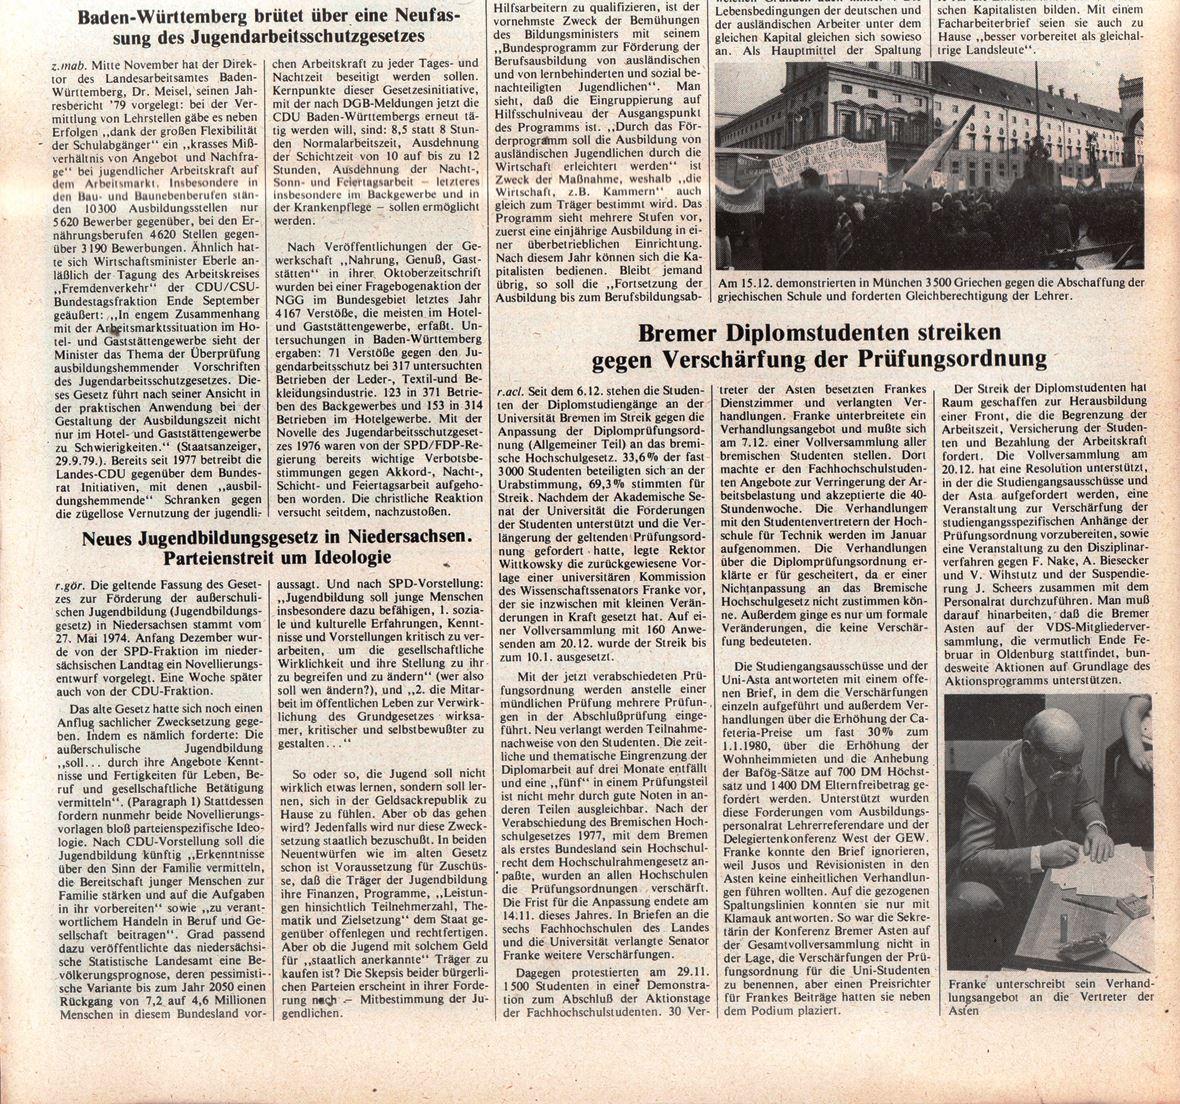 Hamburg_KVZ_1979_52_24